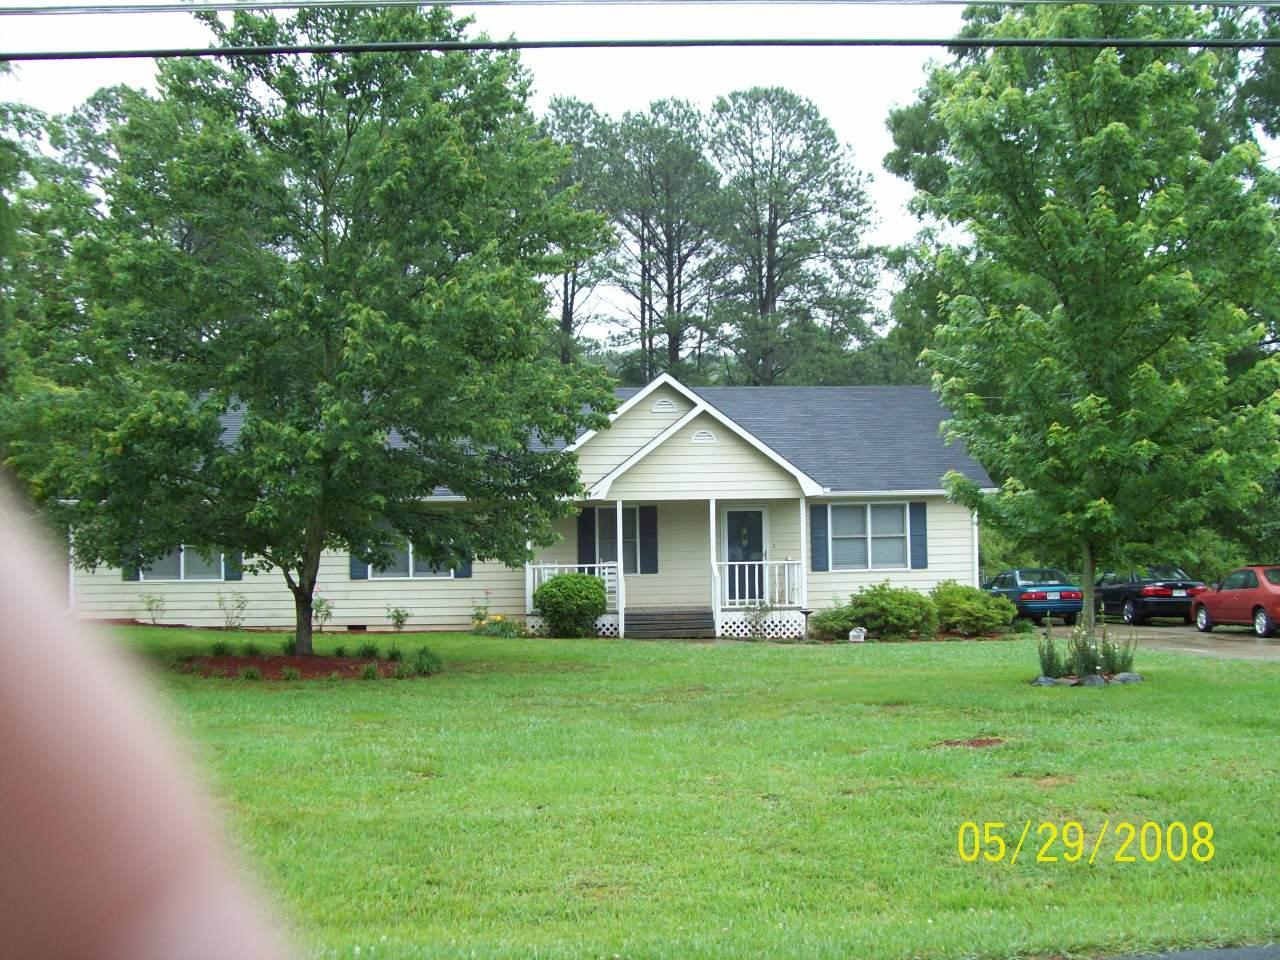 Cartersville, Georgia GA For Sale By Owner, Georgia FSBO Home in Cartersville GA, DAVIS DR